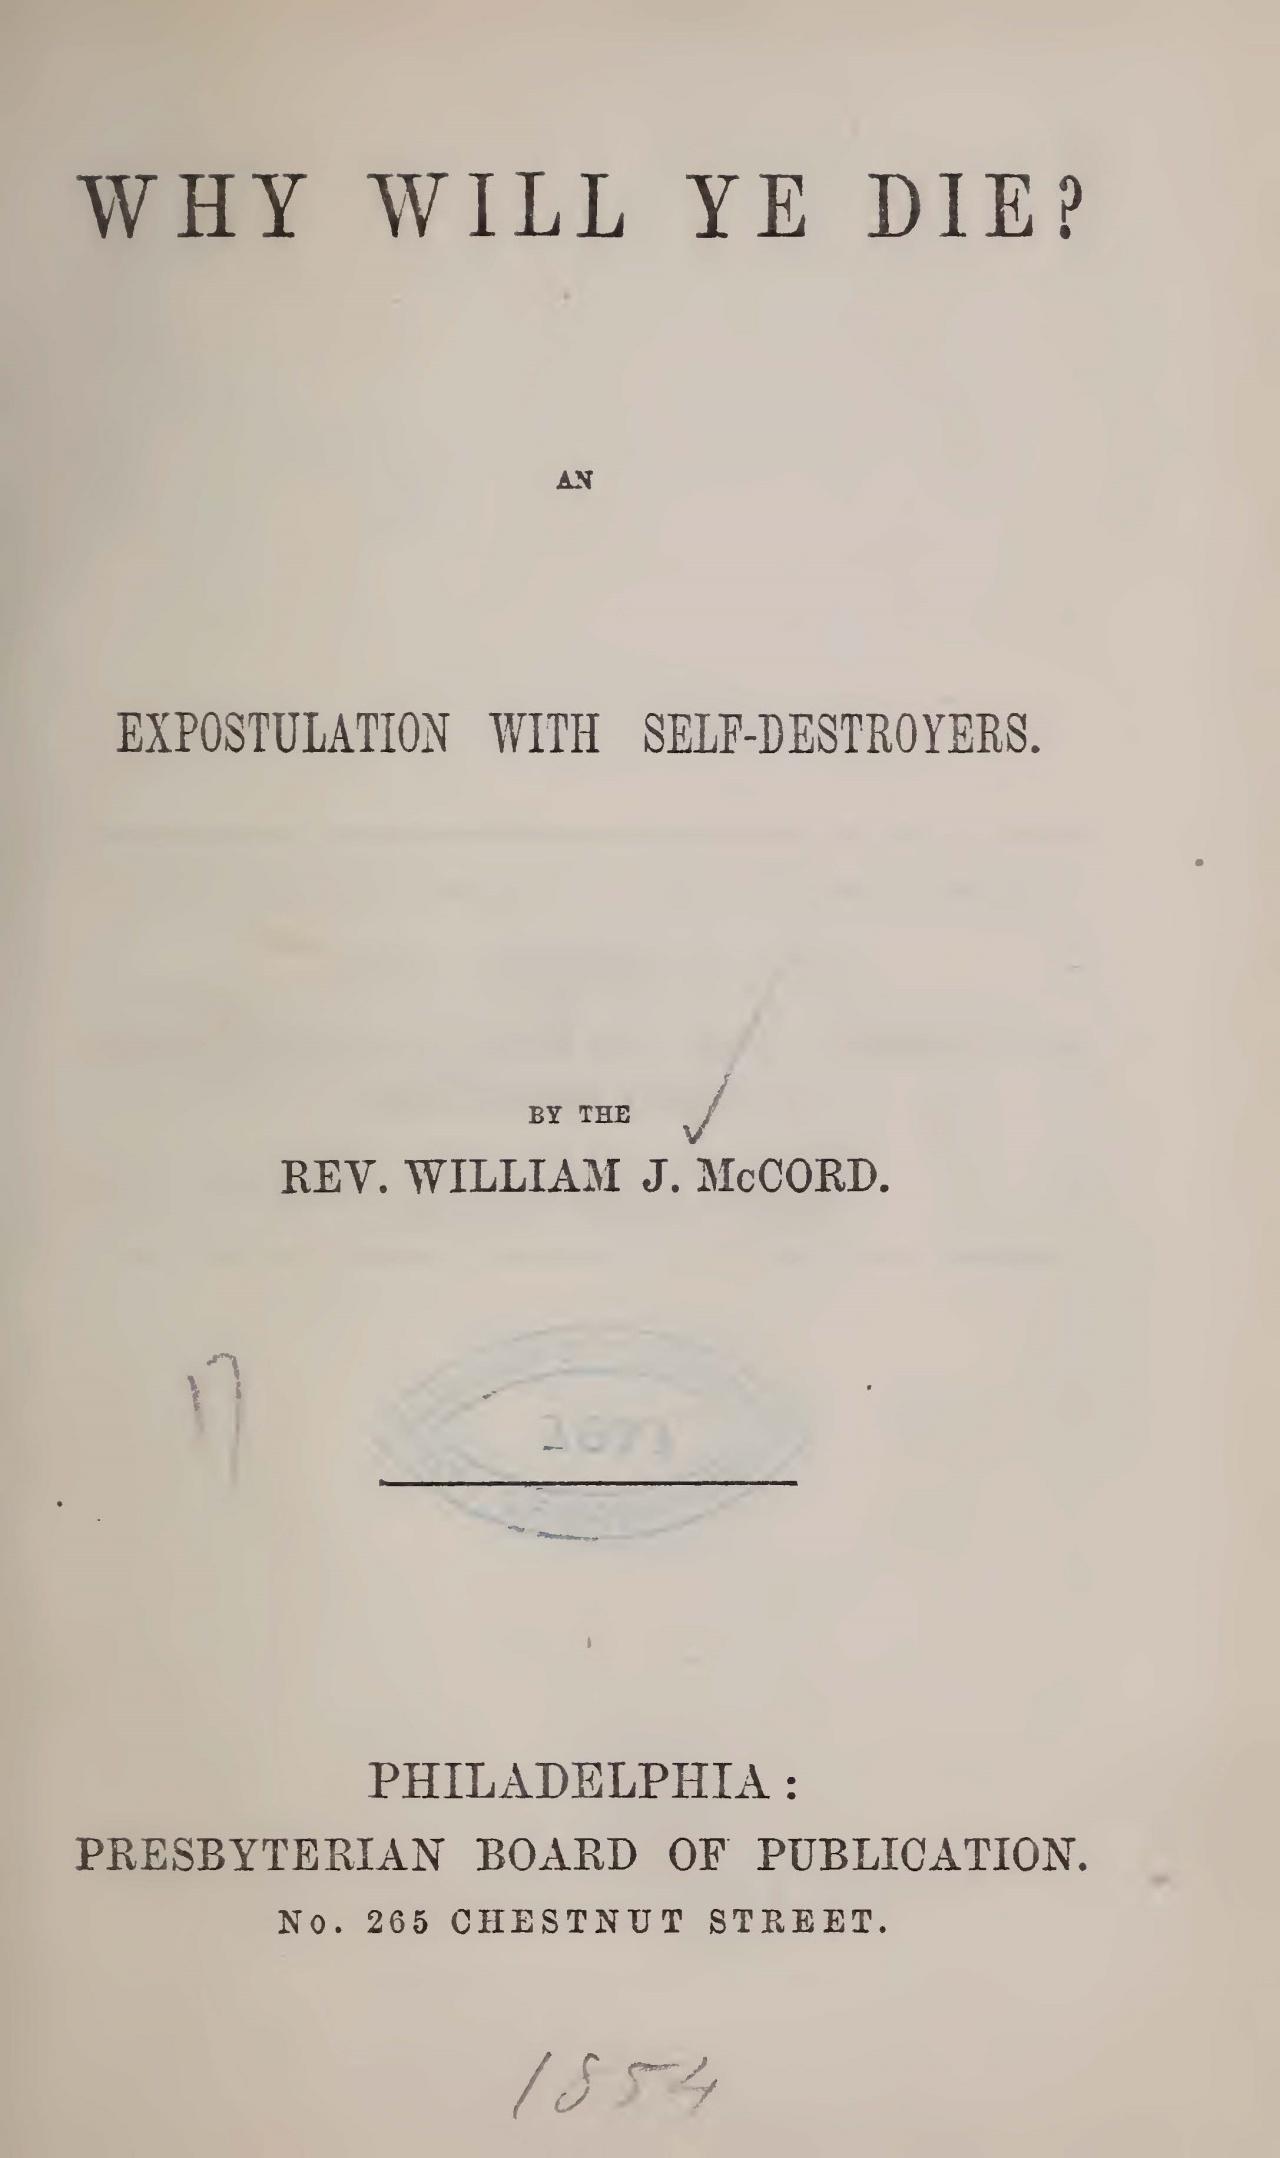 McCord, William J., Why Will Ye Die Title Page.jpg